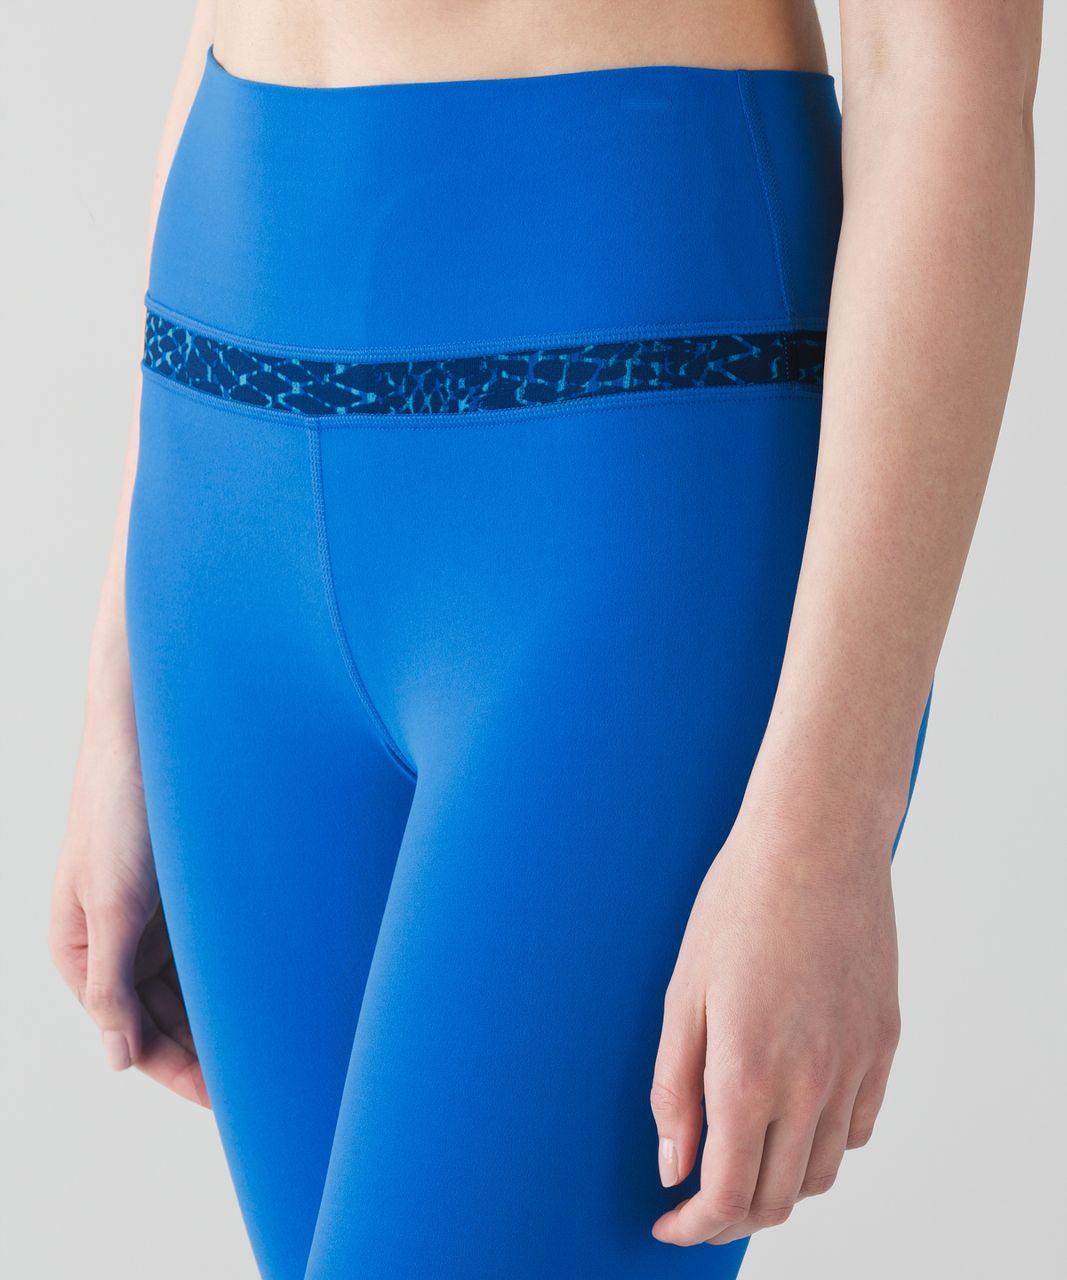 Lululemon Align Pant - Lakeside Blue / Samba Snake Kayak Blue Hero Blue